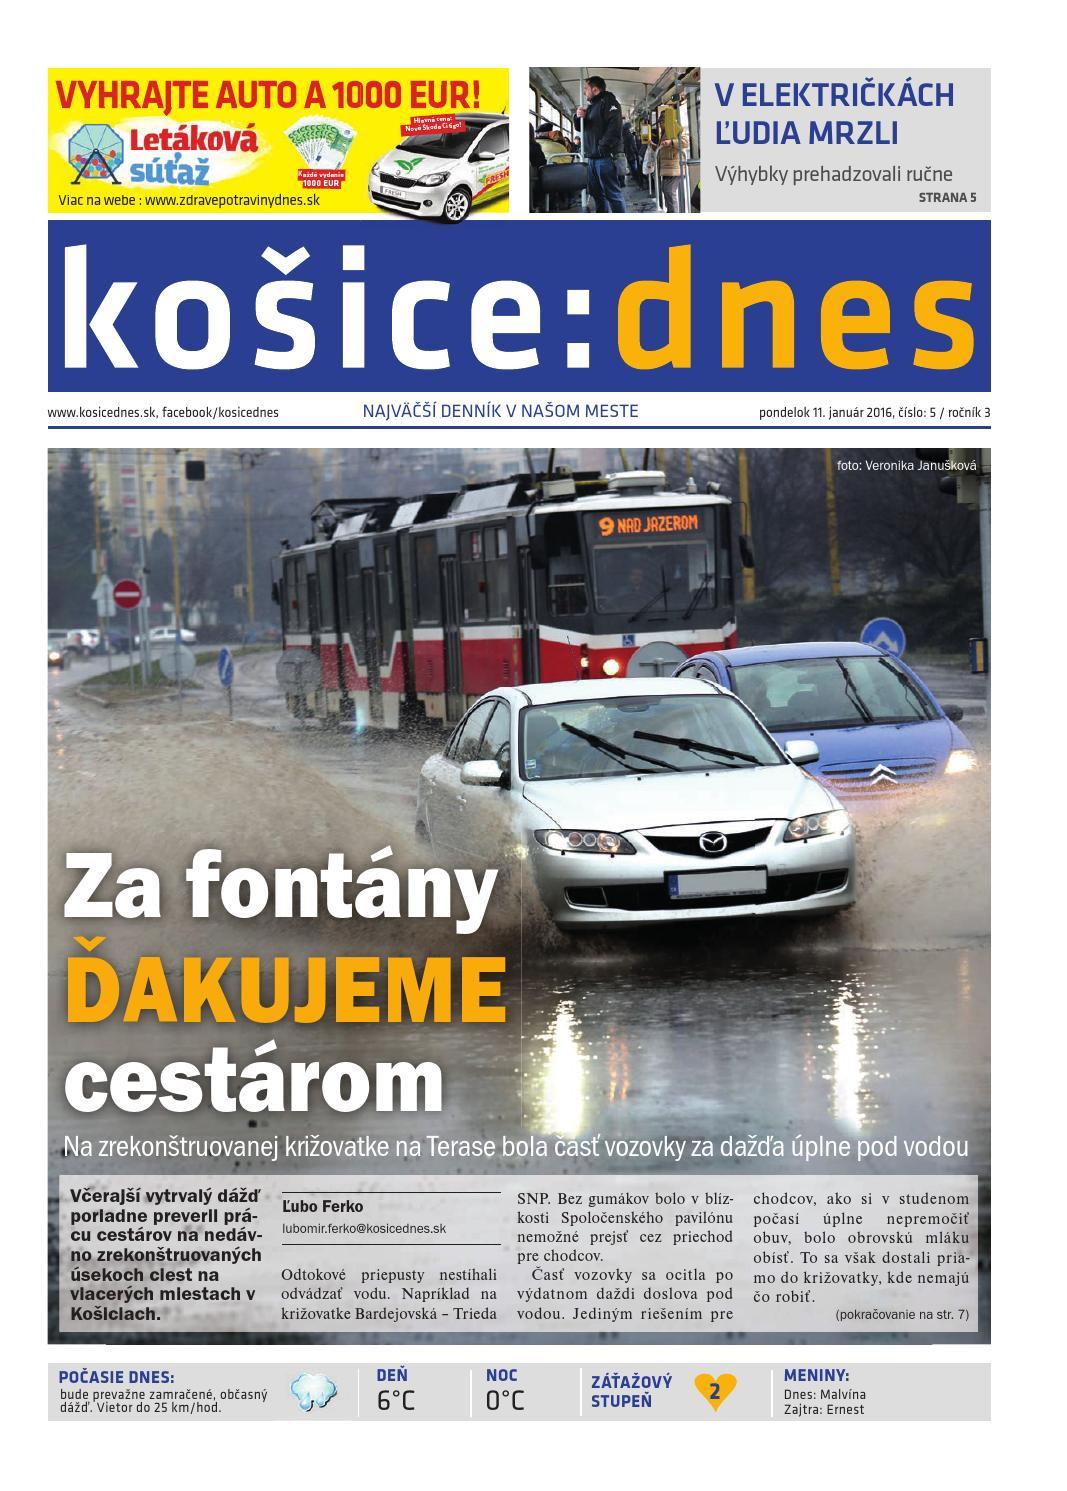 košice dnes 11.1.2016 by KOŠICE DNES - issuu 1f3521a0f9a